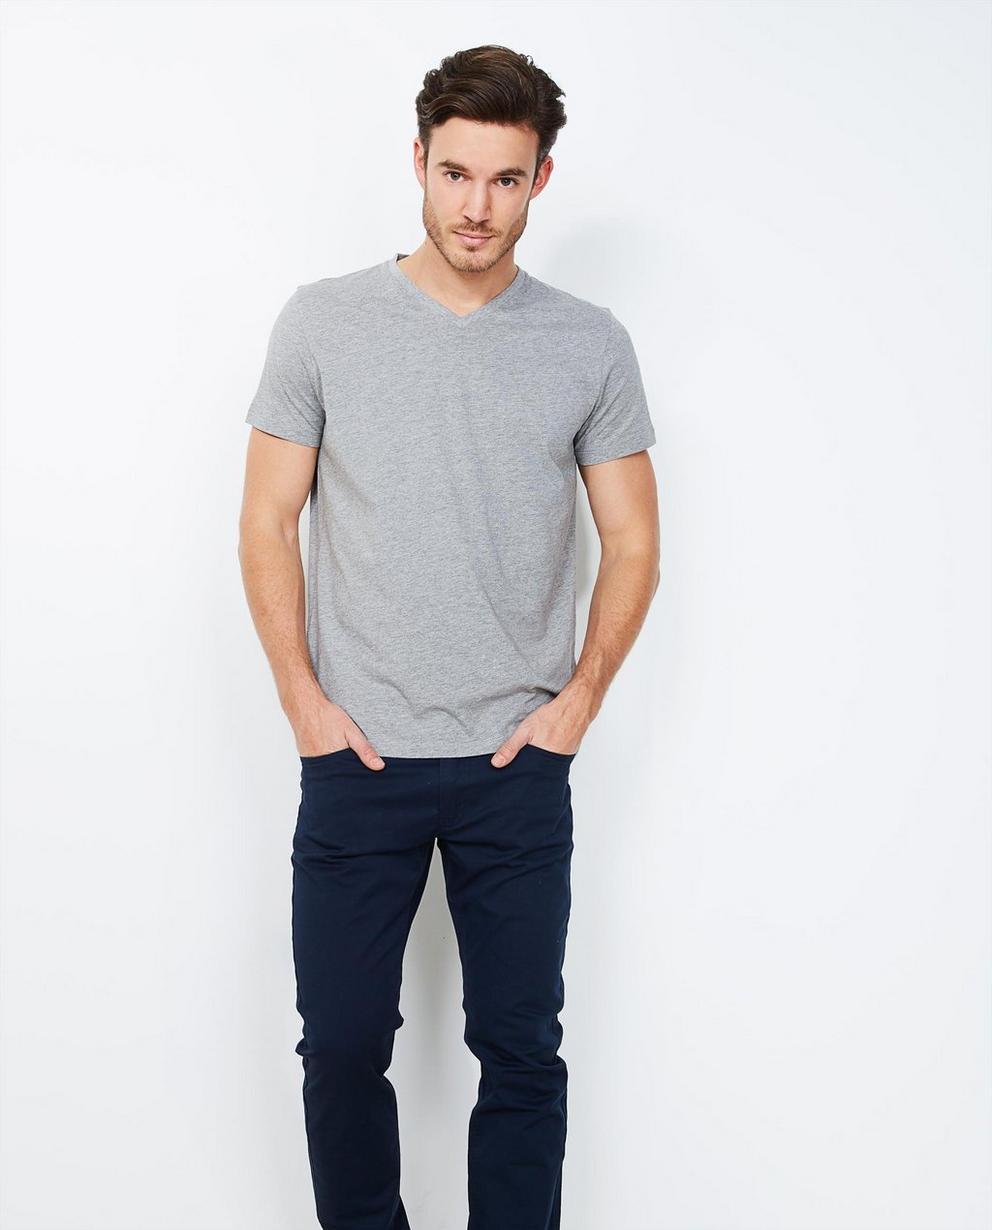 Pantalon slim fit SMITH - bleu nuit - JBC